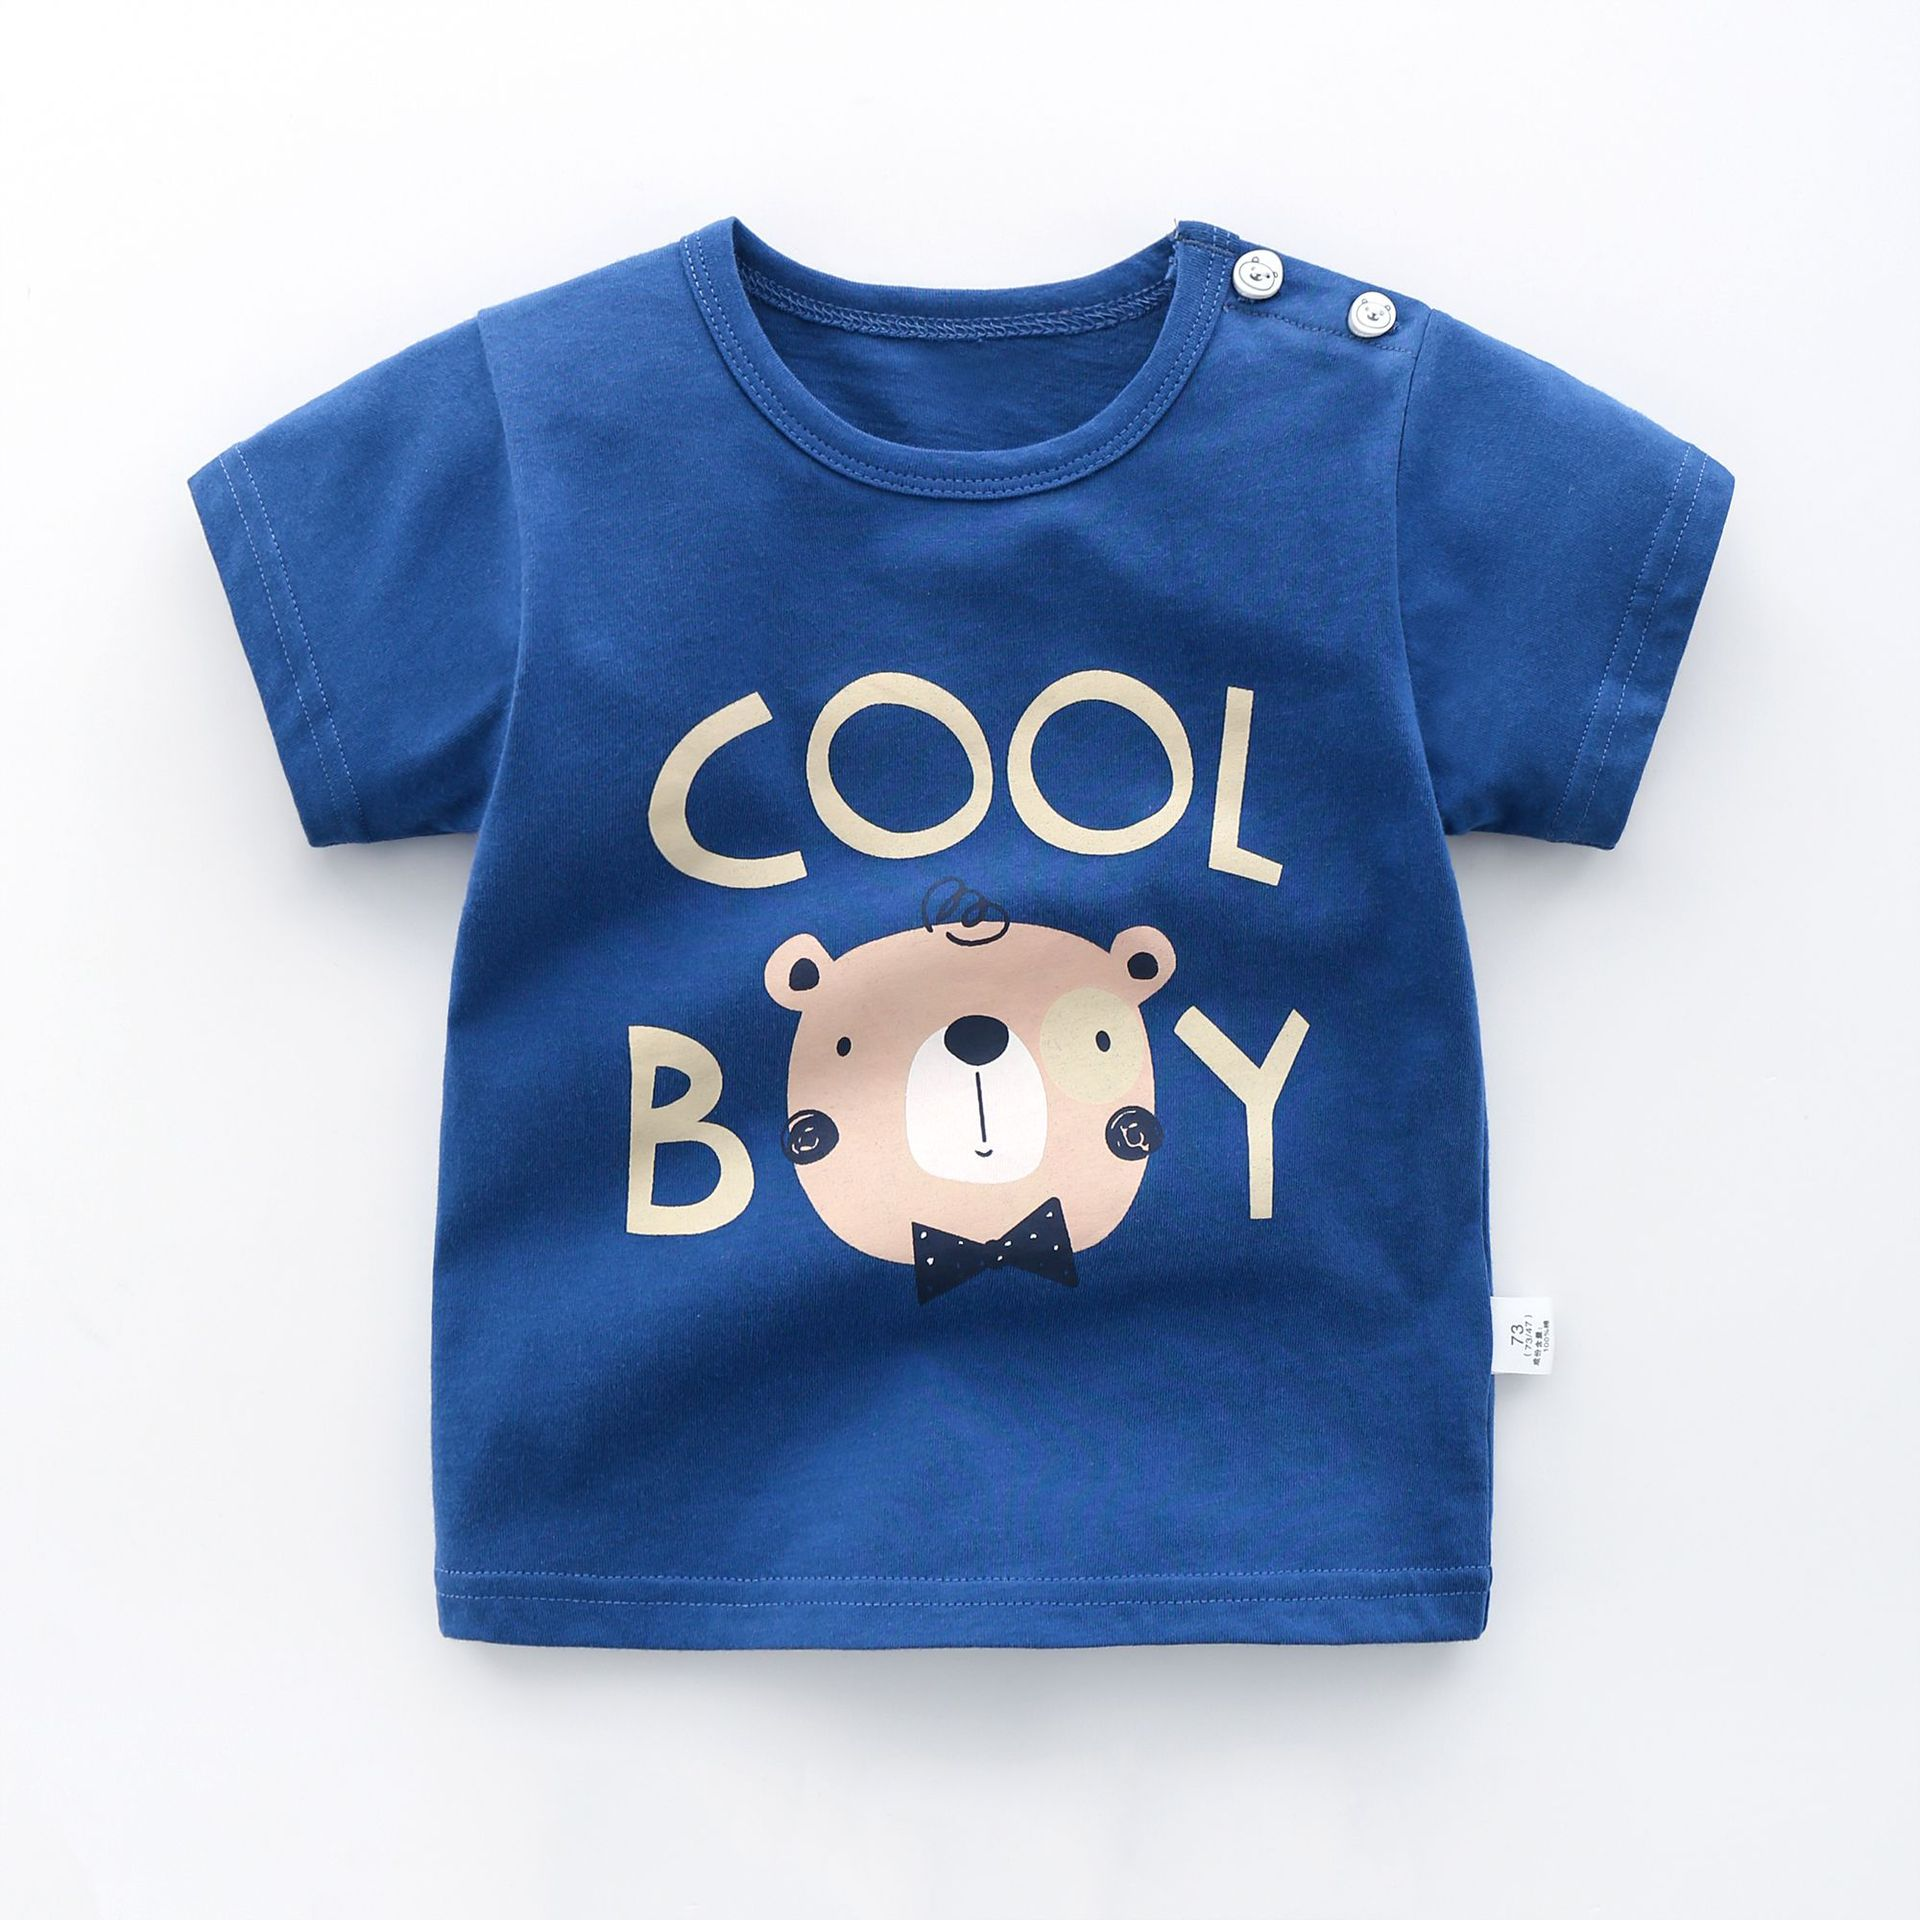 Infant Boys Girls Soft Tee Sun Sleep T-Shirt 6M-24M